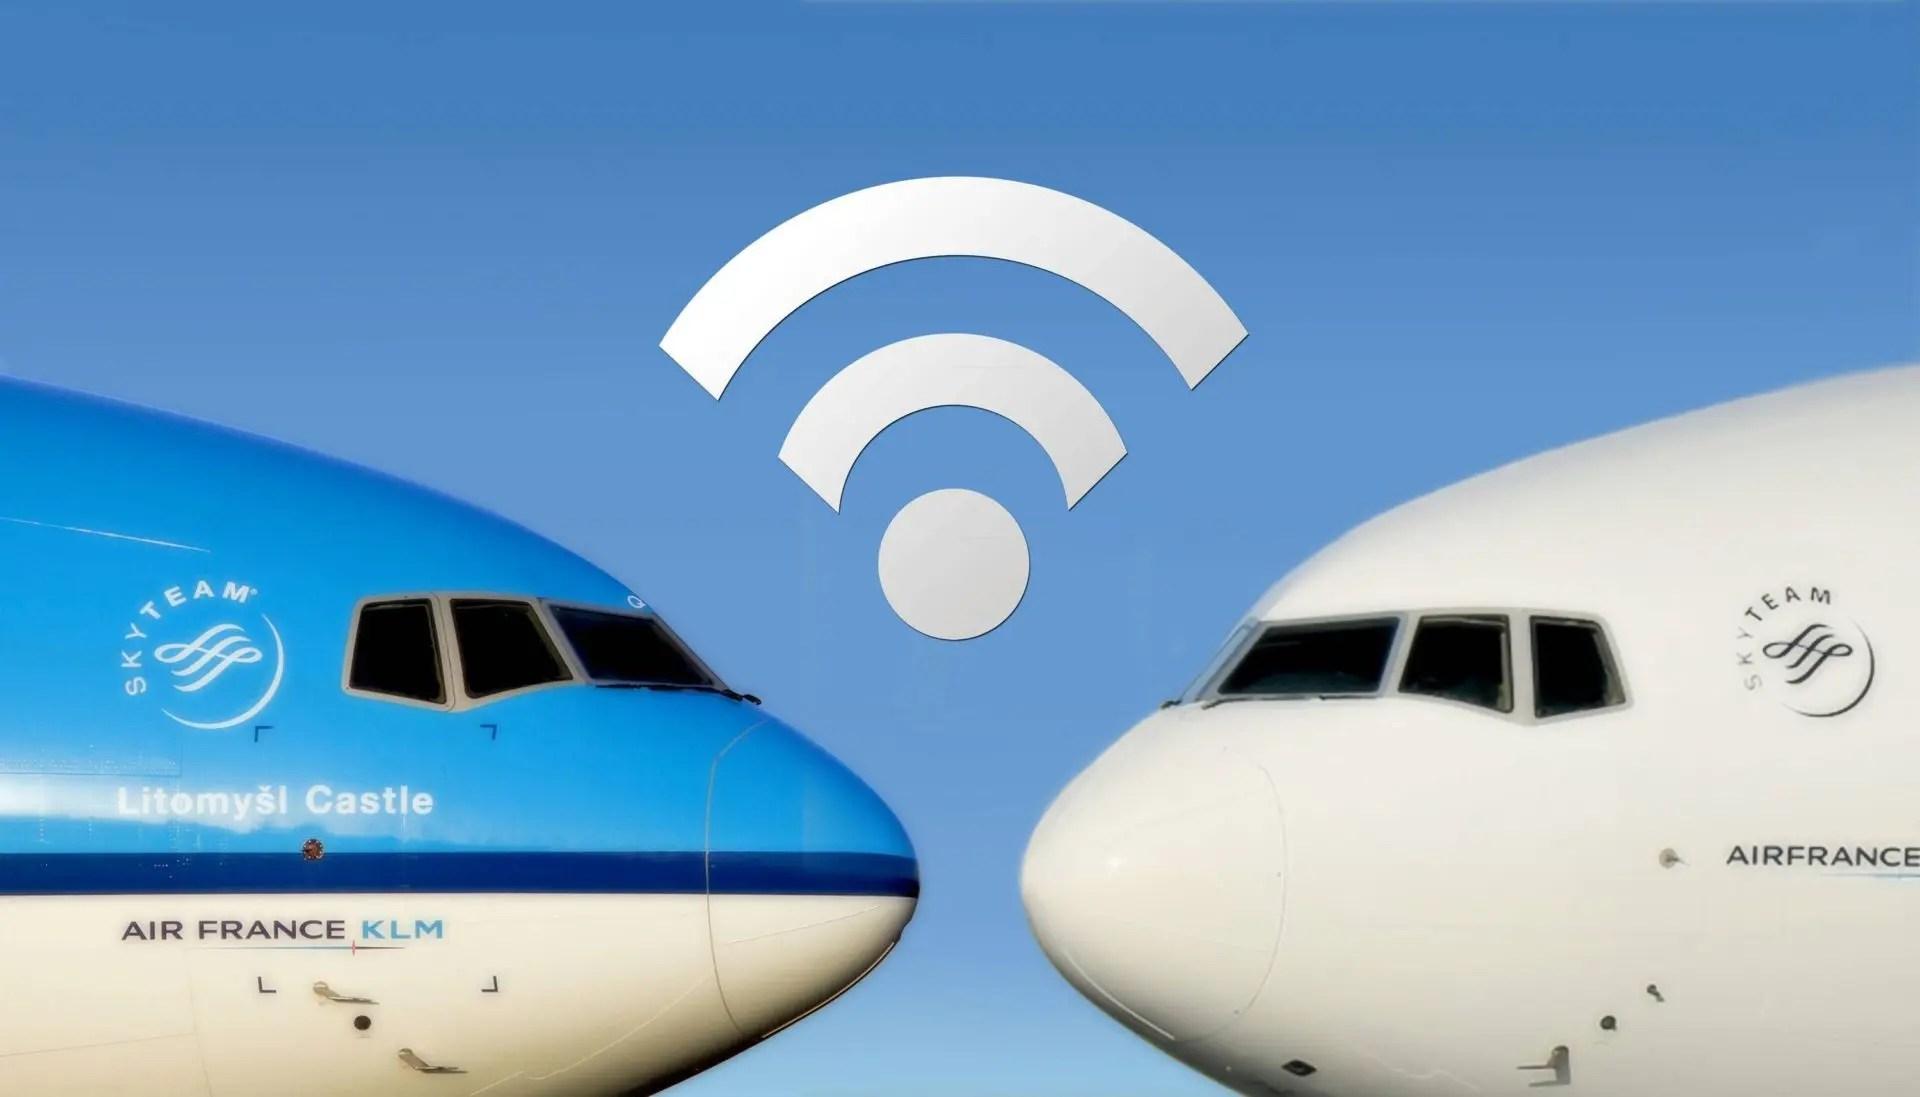 print-wifi-777-afkl